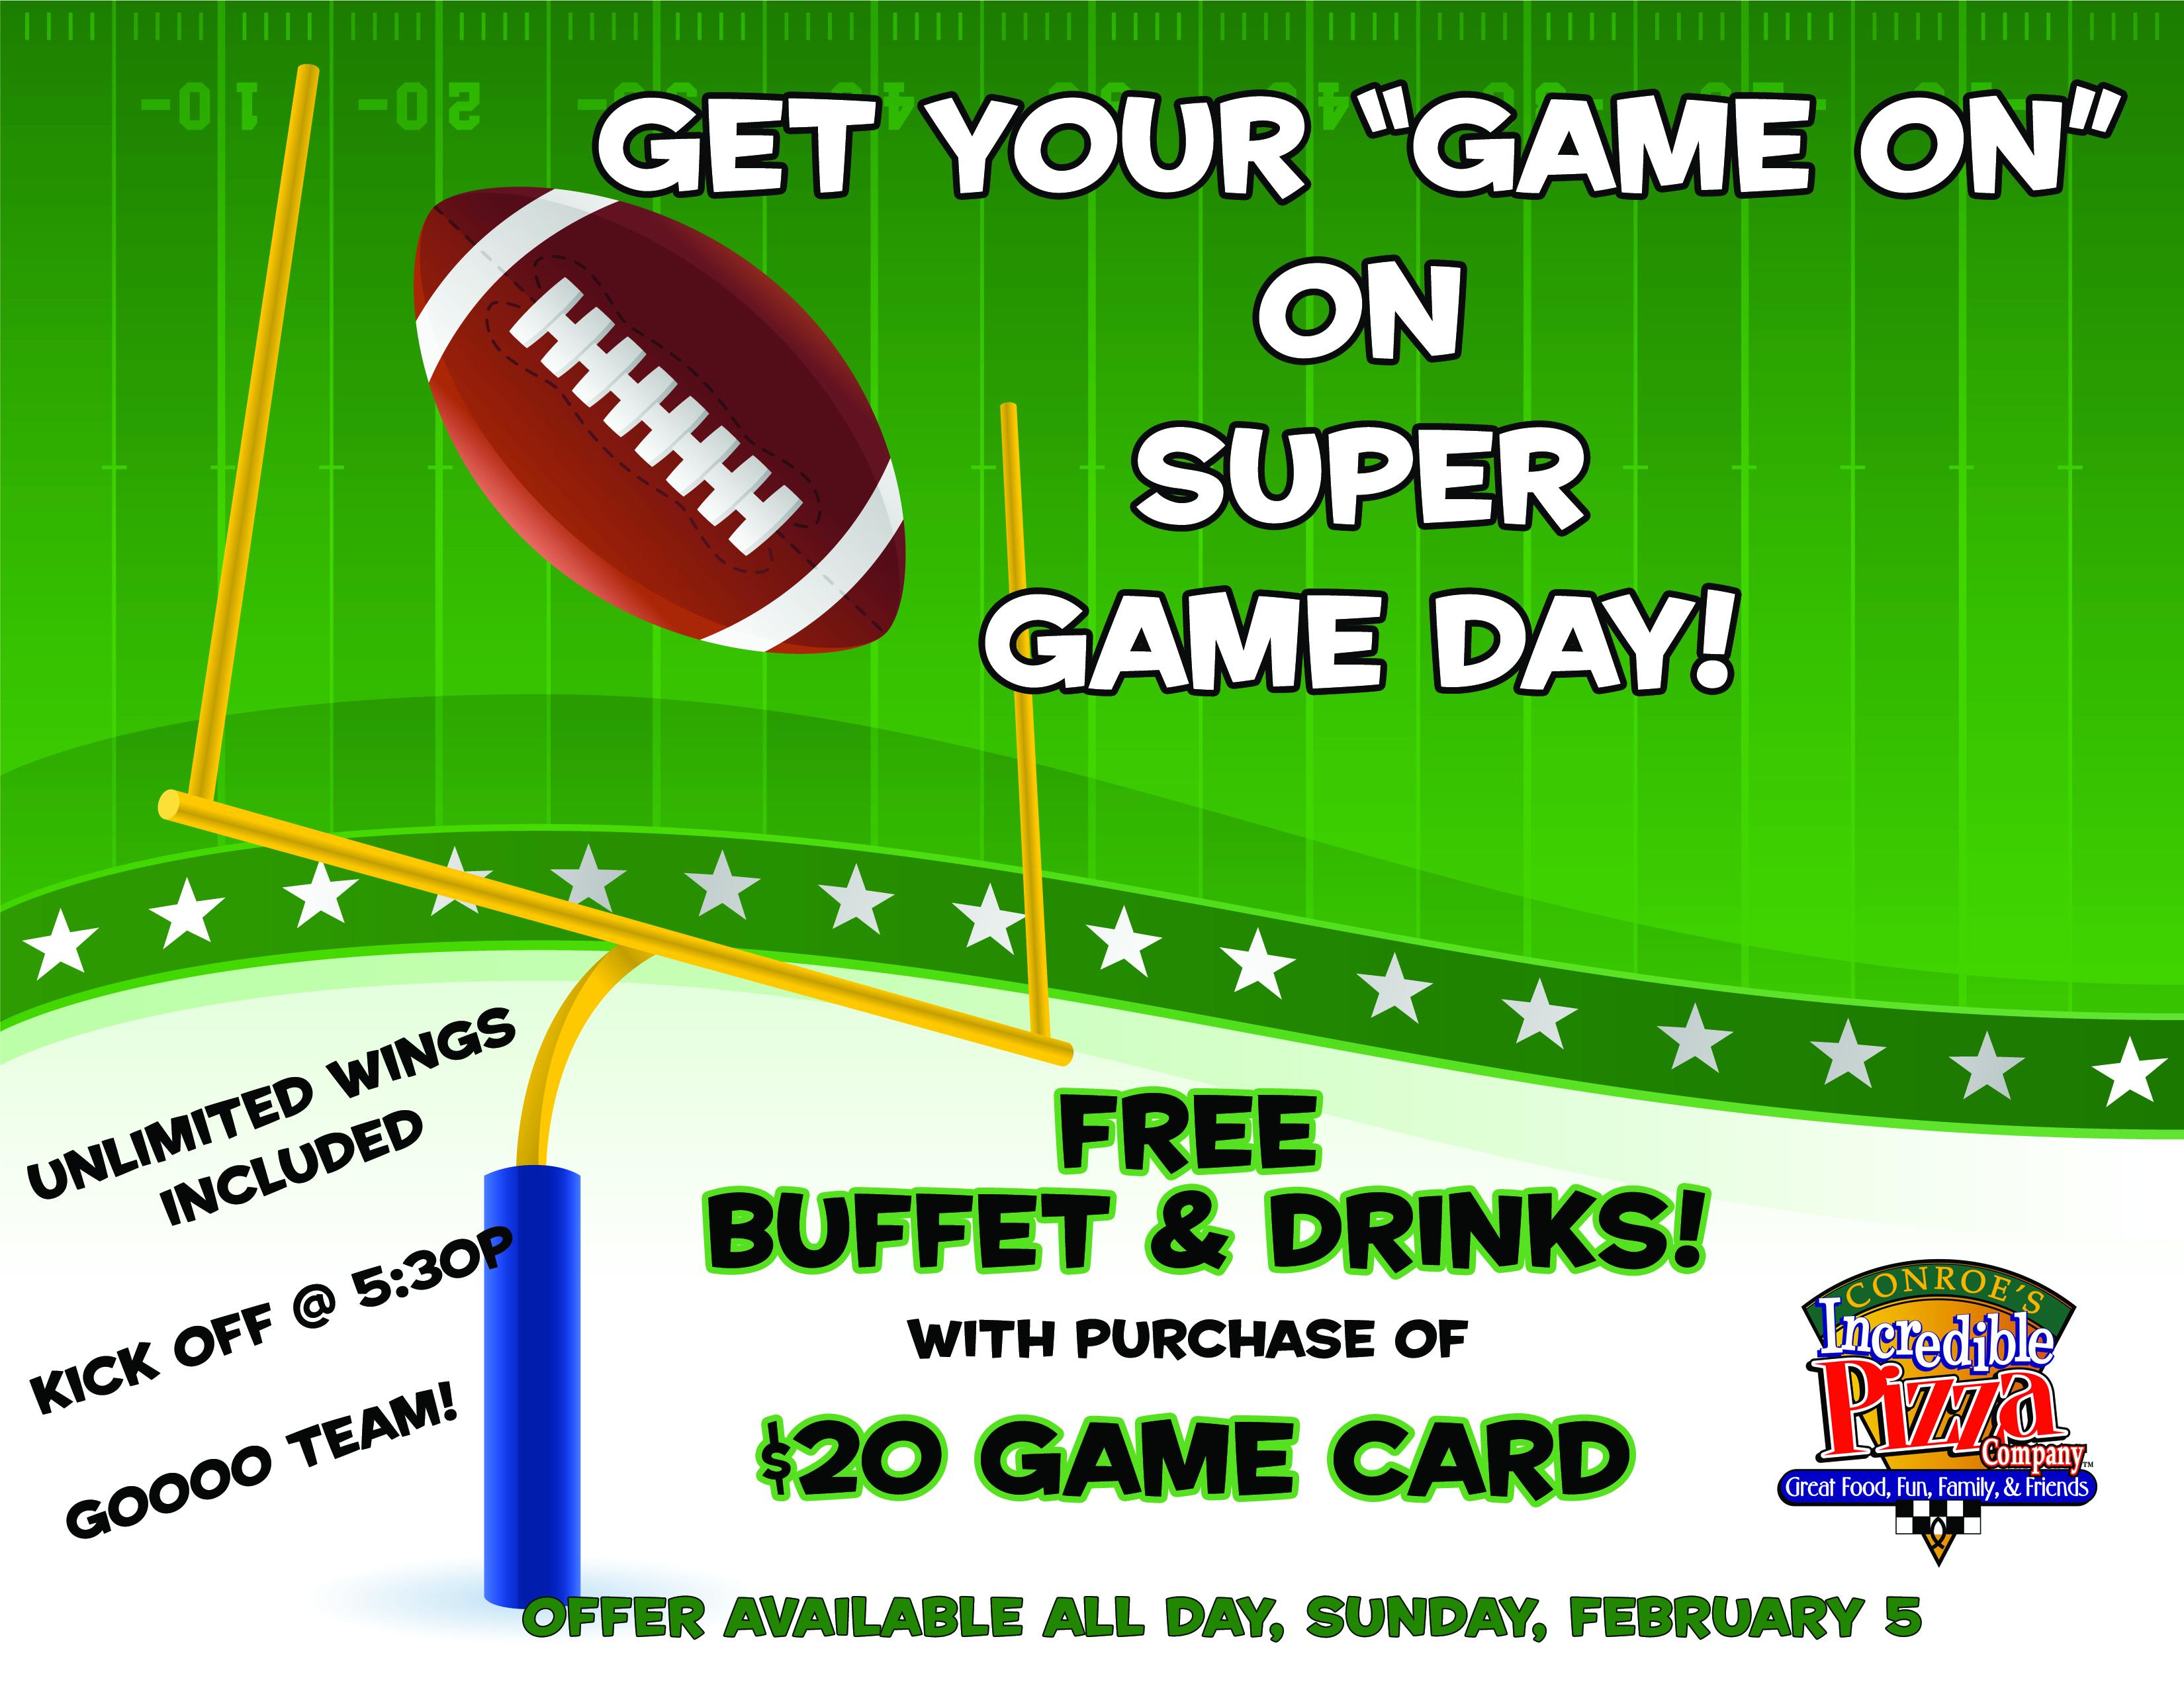 Super Game Day! Sun., Feb. 5